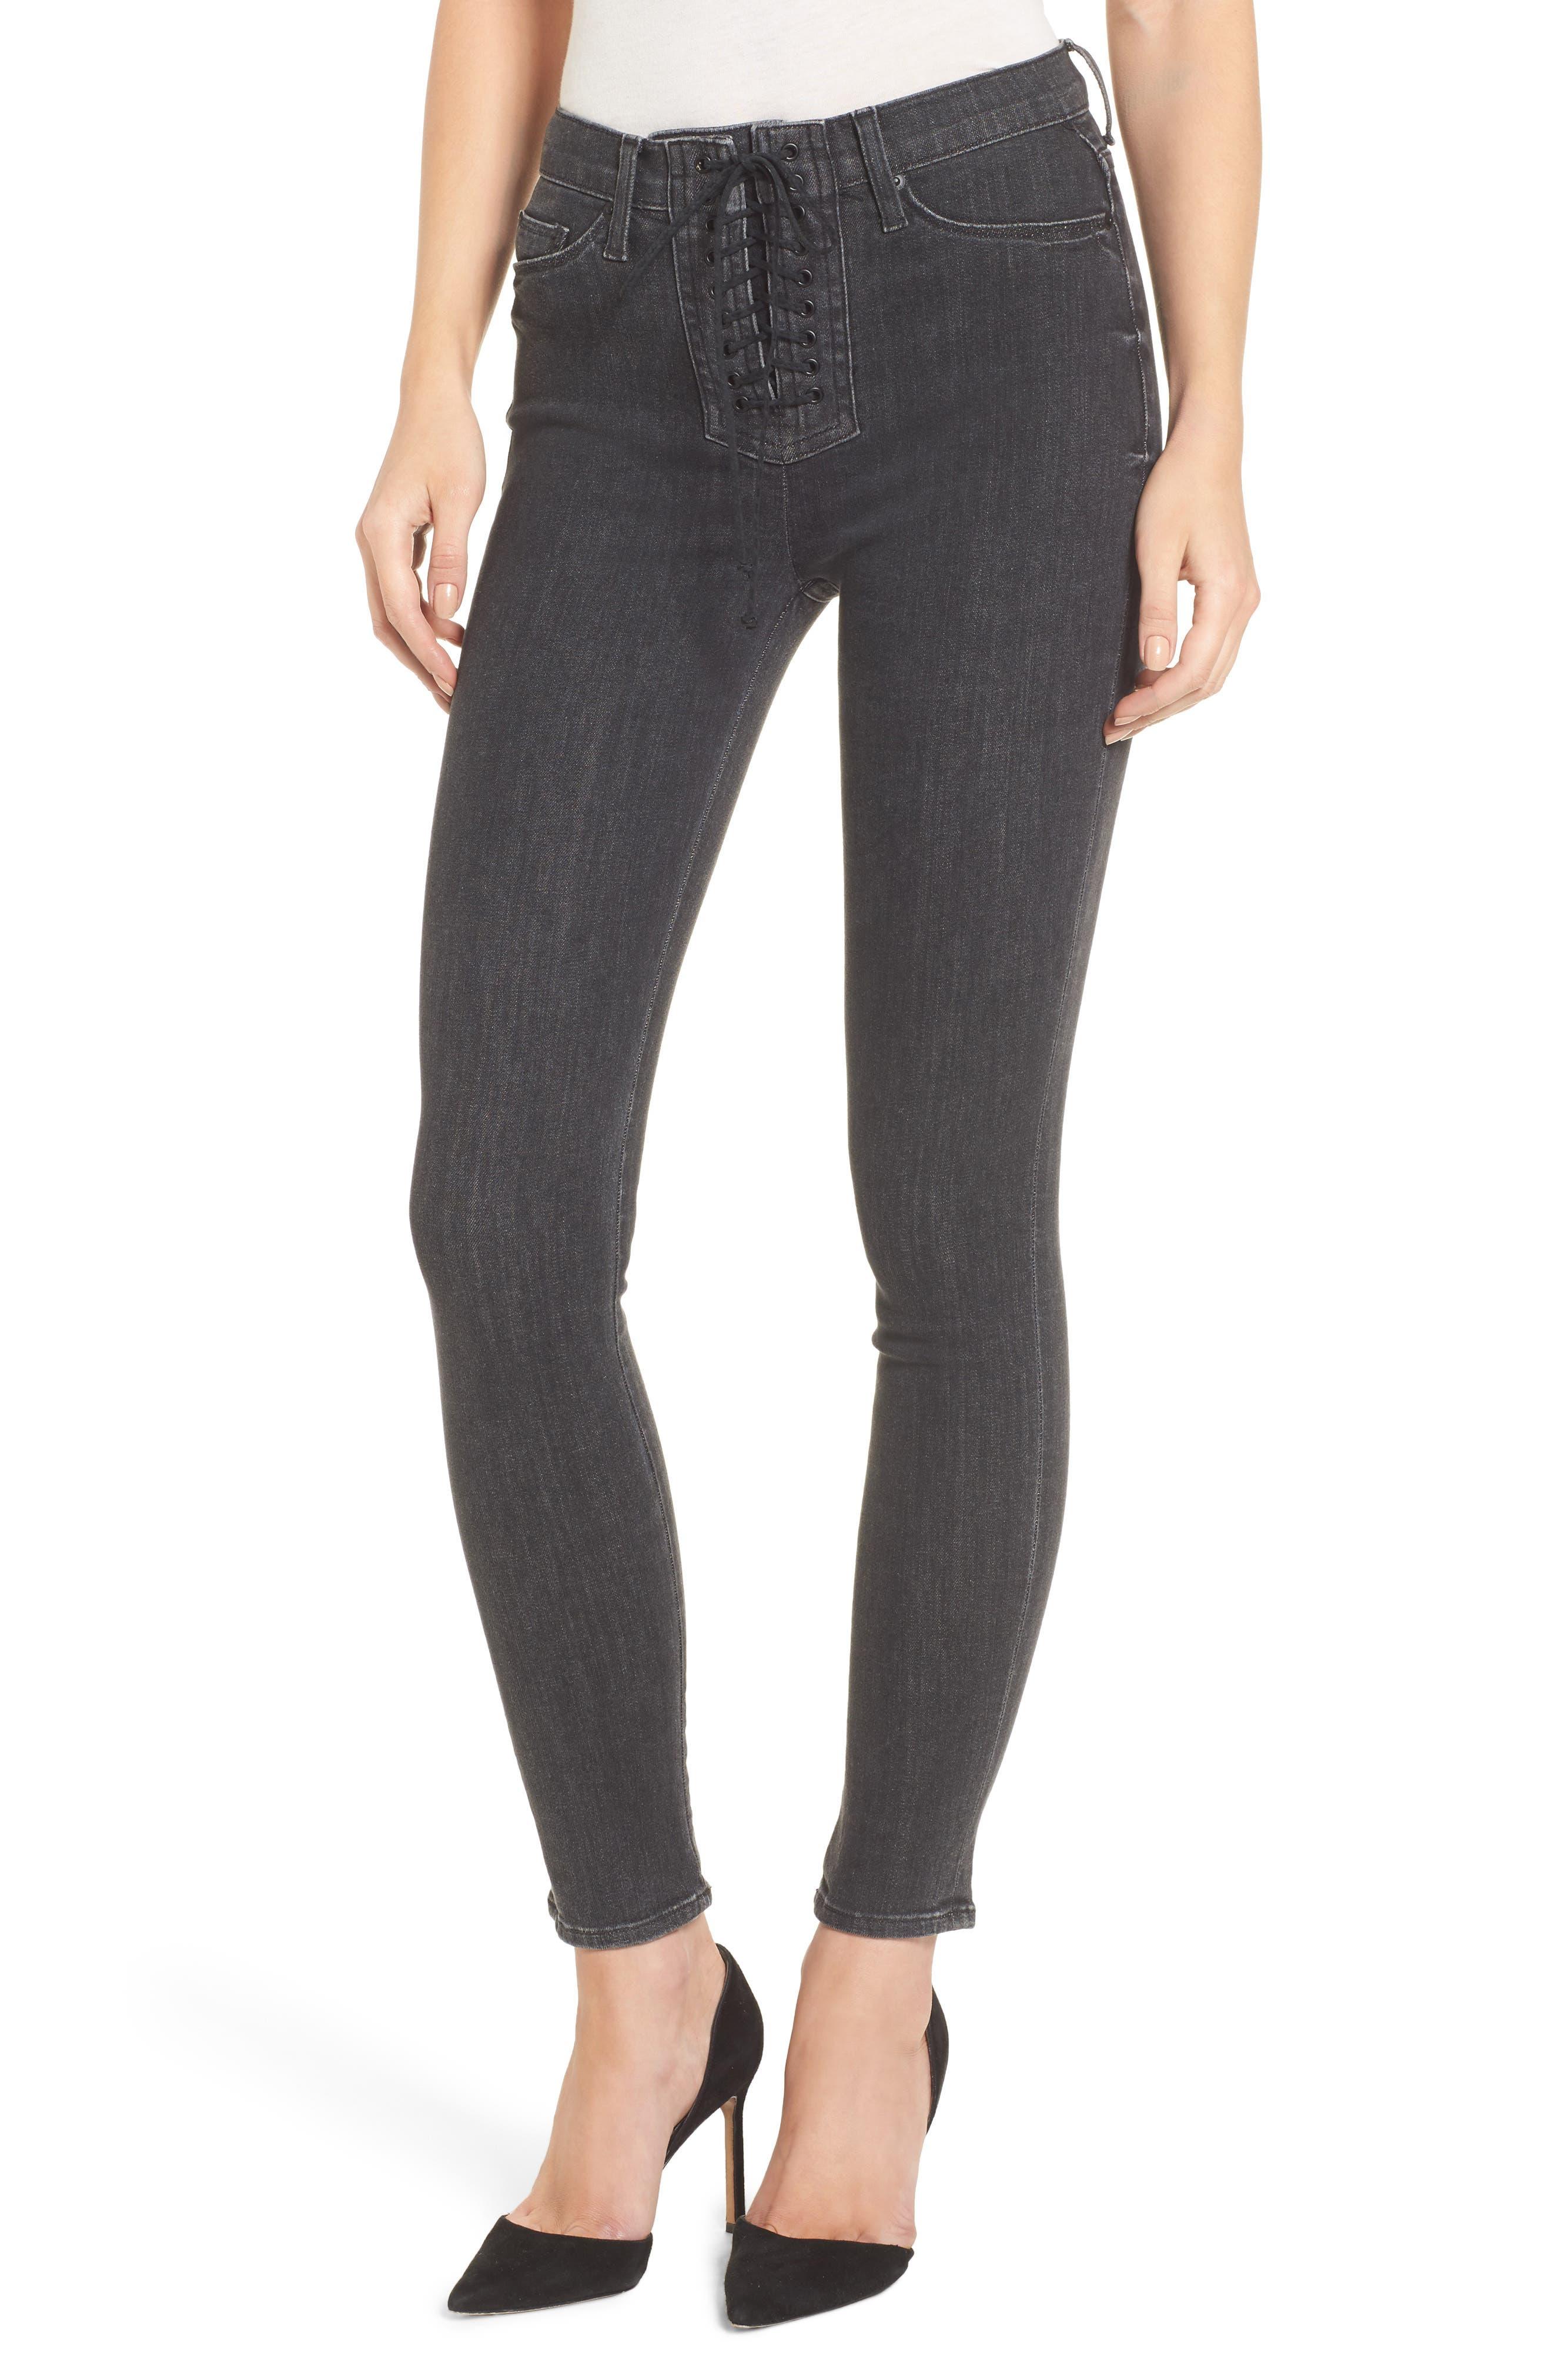 Alternate Image 1 Selected - Hudson Jeans Bullocks High Waist Lace-Up Skinny Jeans (Disarm)